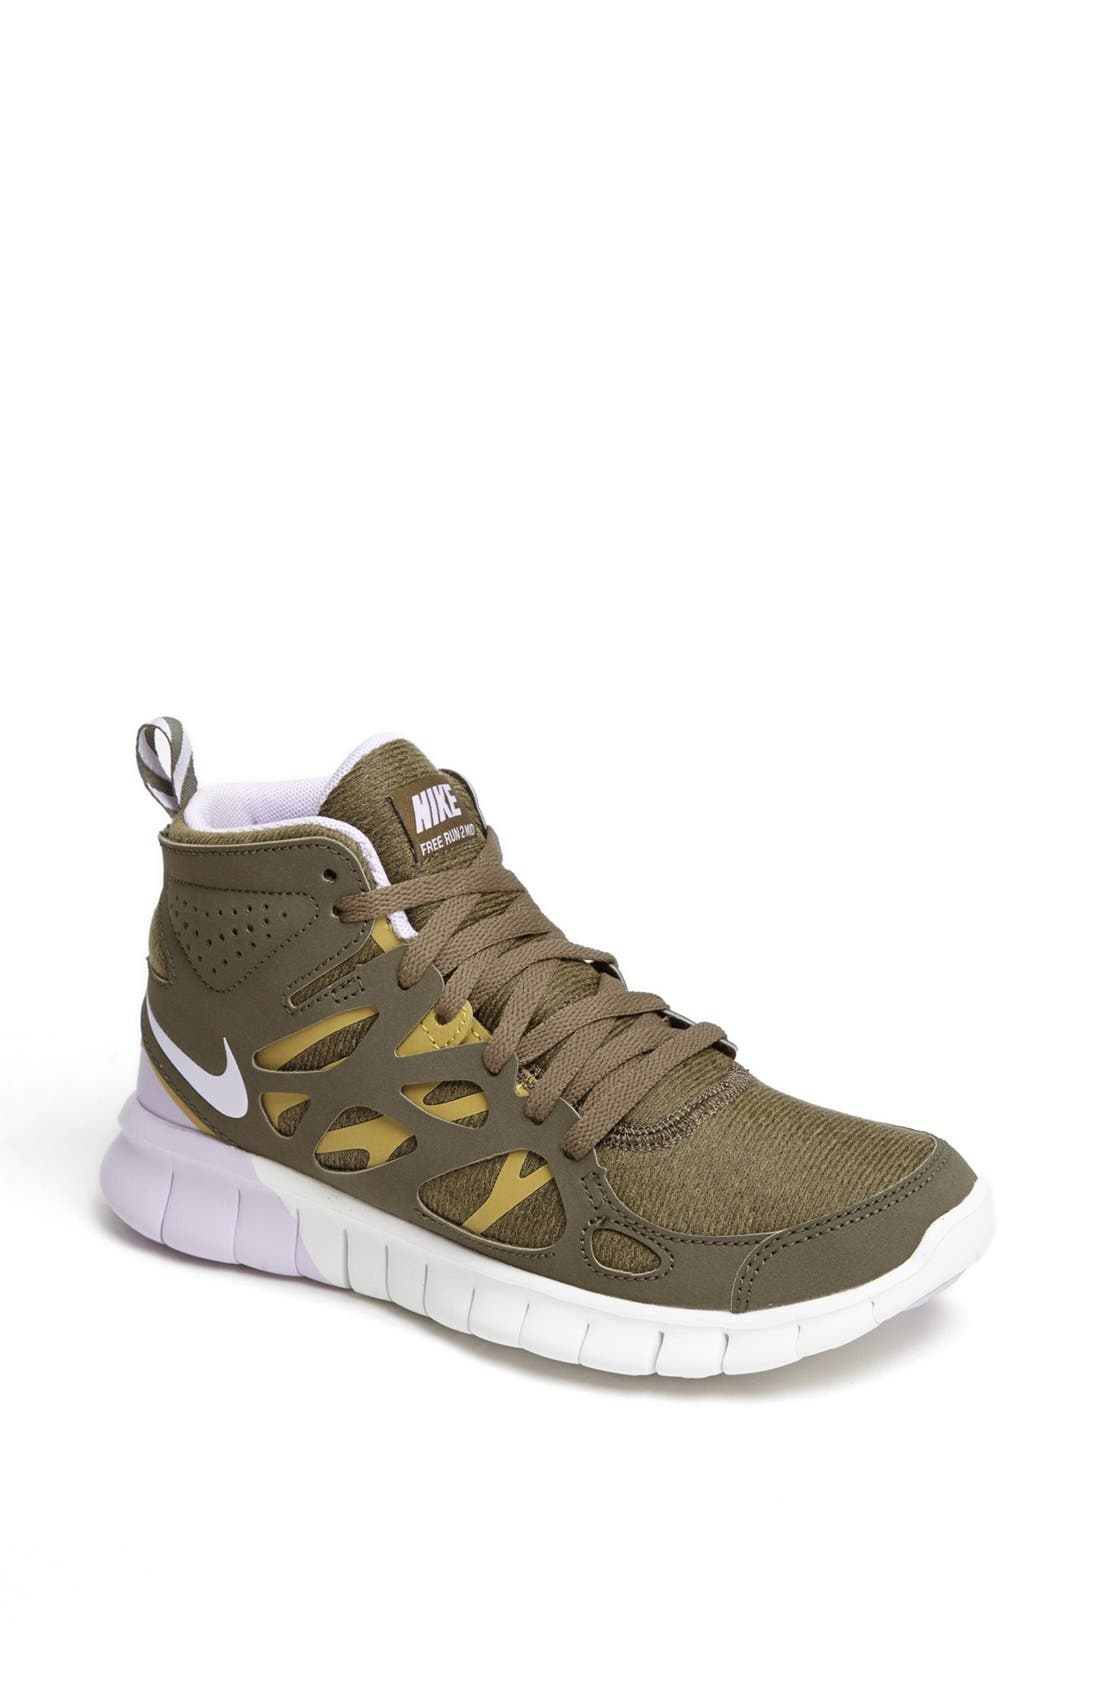 Main Image - Nike 'Free Run 2' Sneaker Boot